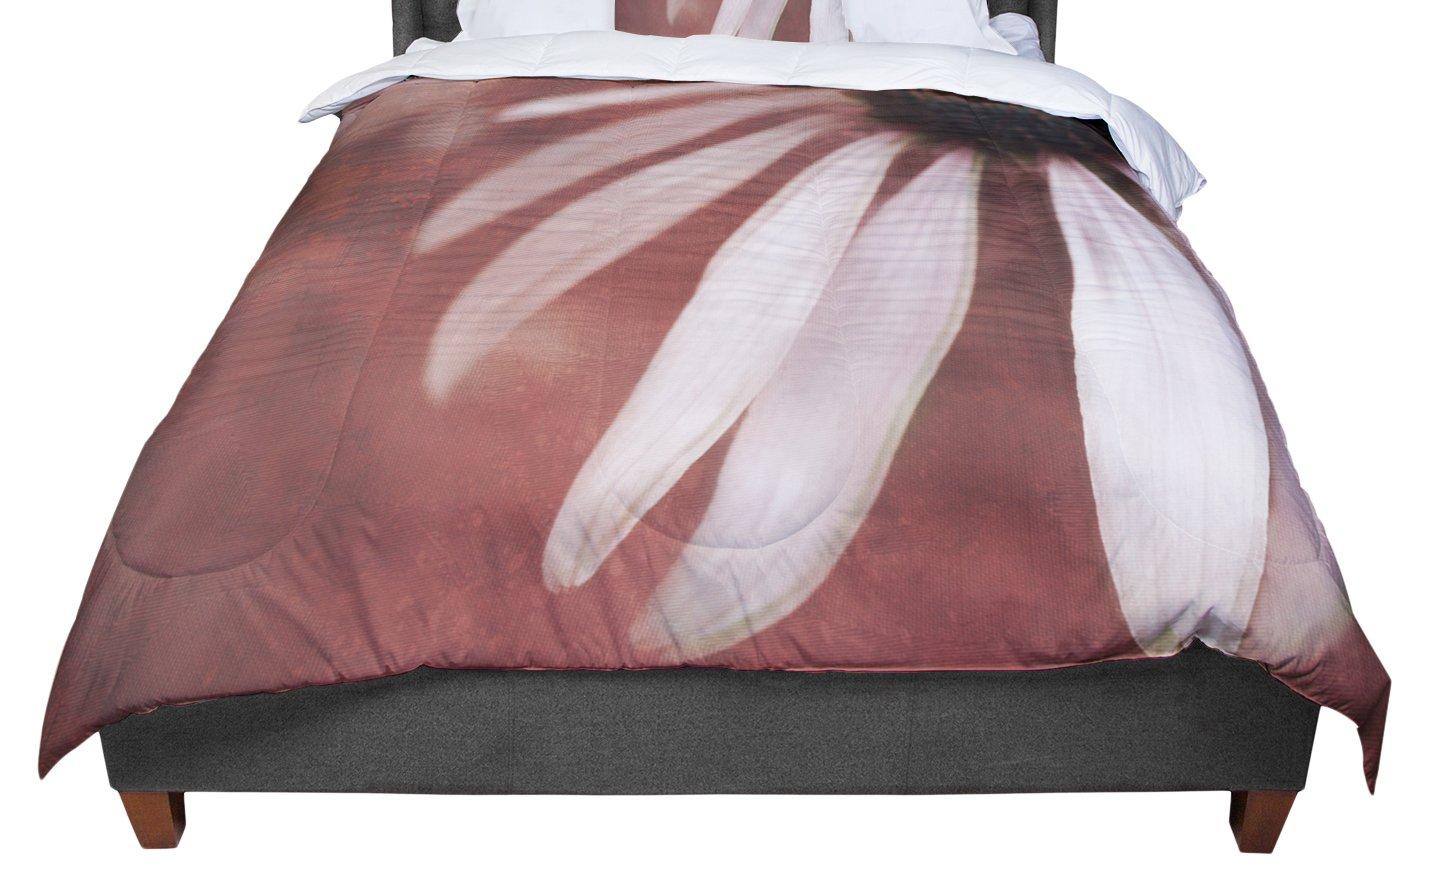 KESS InHouse Iris Lehnhardt 'Copper & Pale Pink' Brown Flower King / Cal King Comforter, 104' X 88'